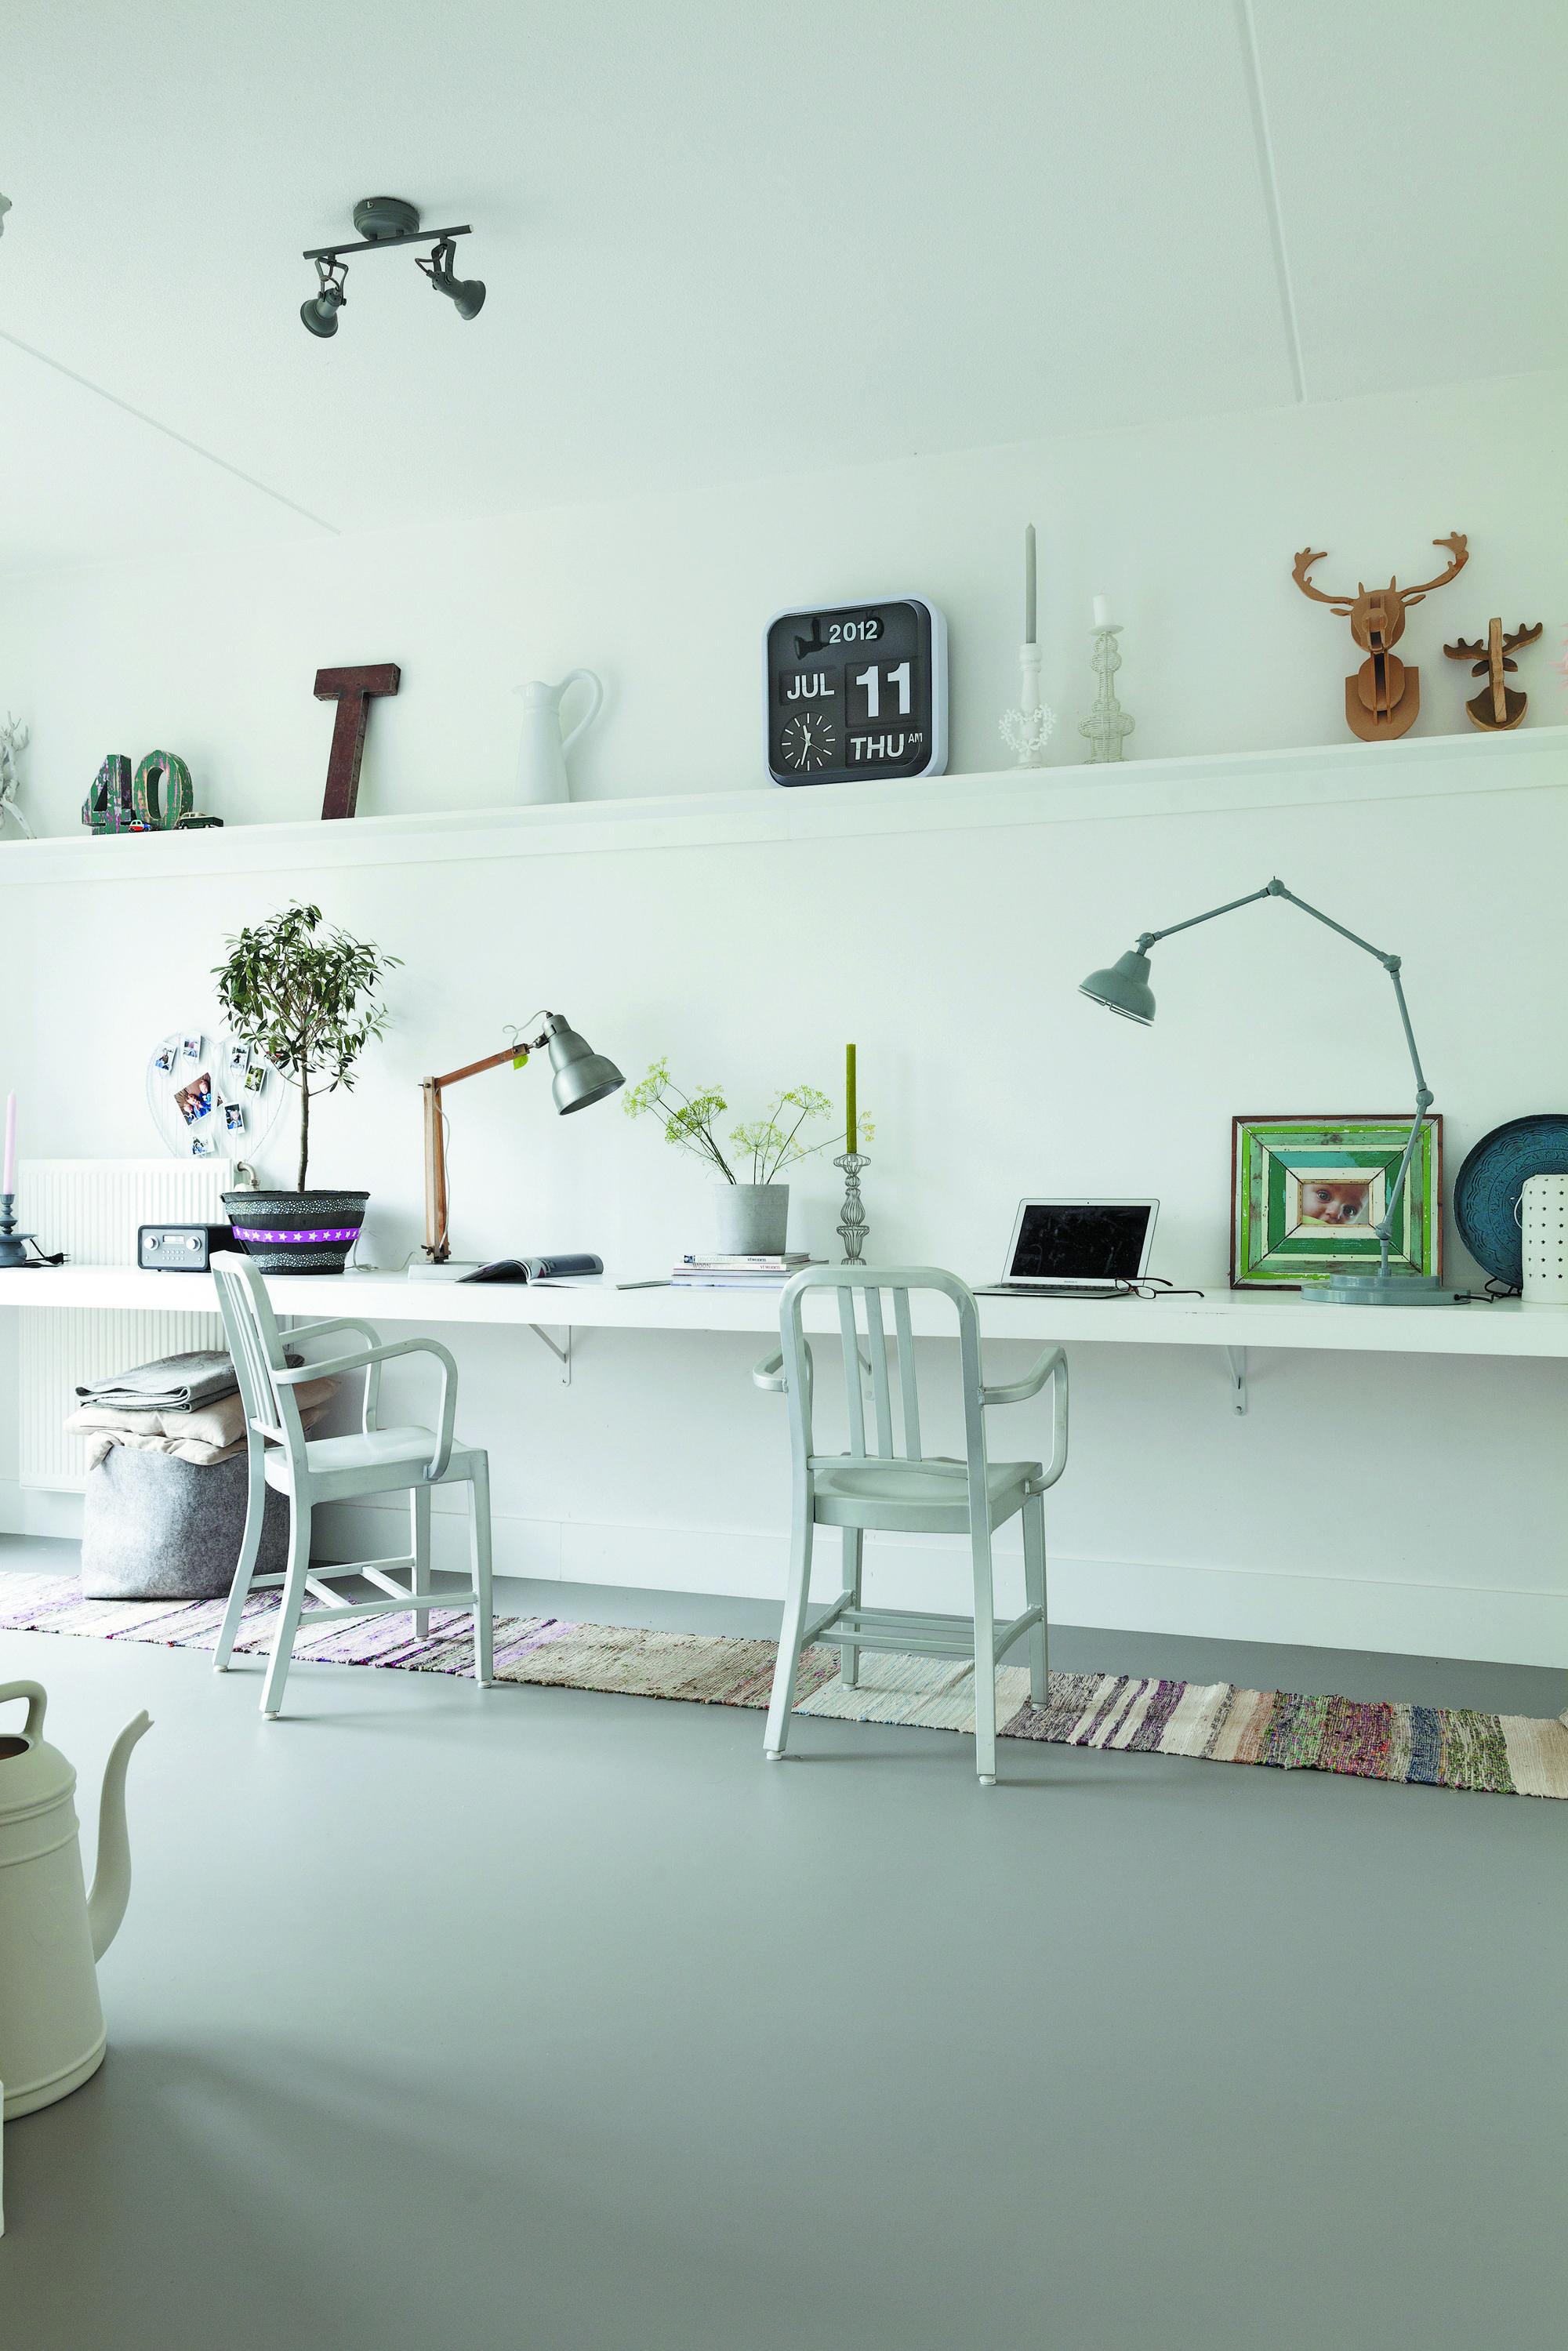 marmoleum boer staphorst vloer inspiratie pinterest home